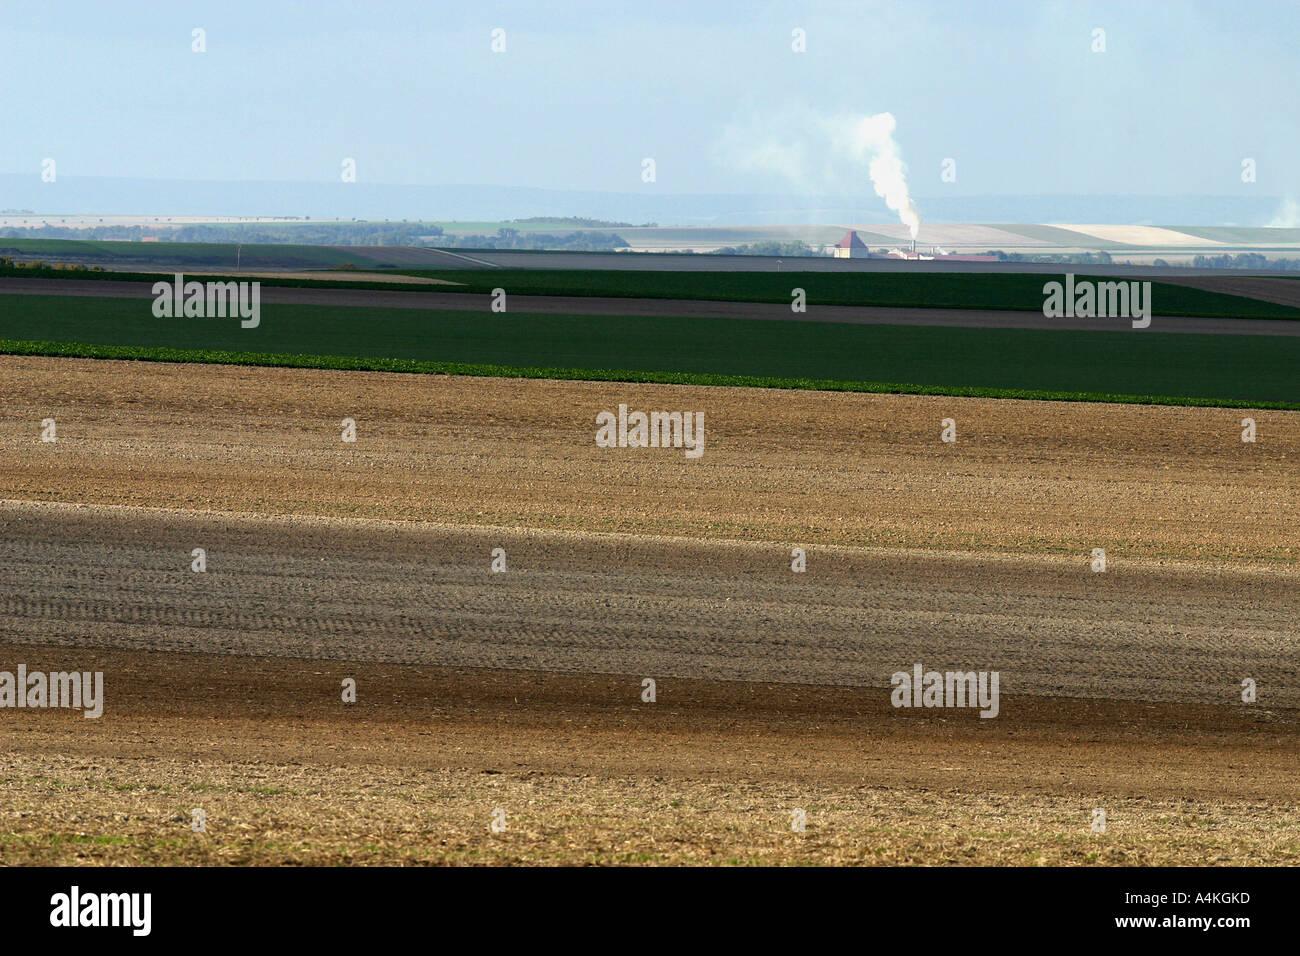 France, Champagne-Ardenne region, fields - Stock Image